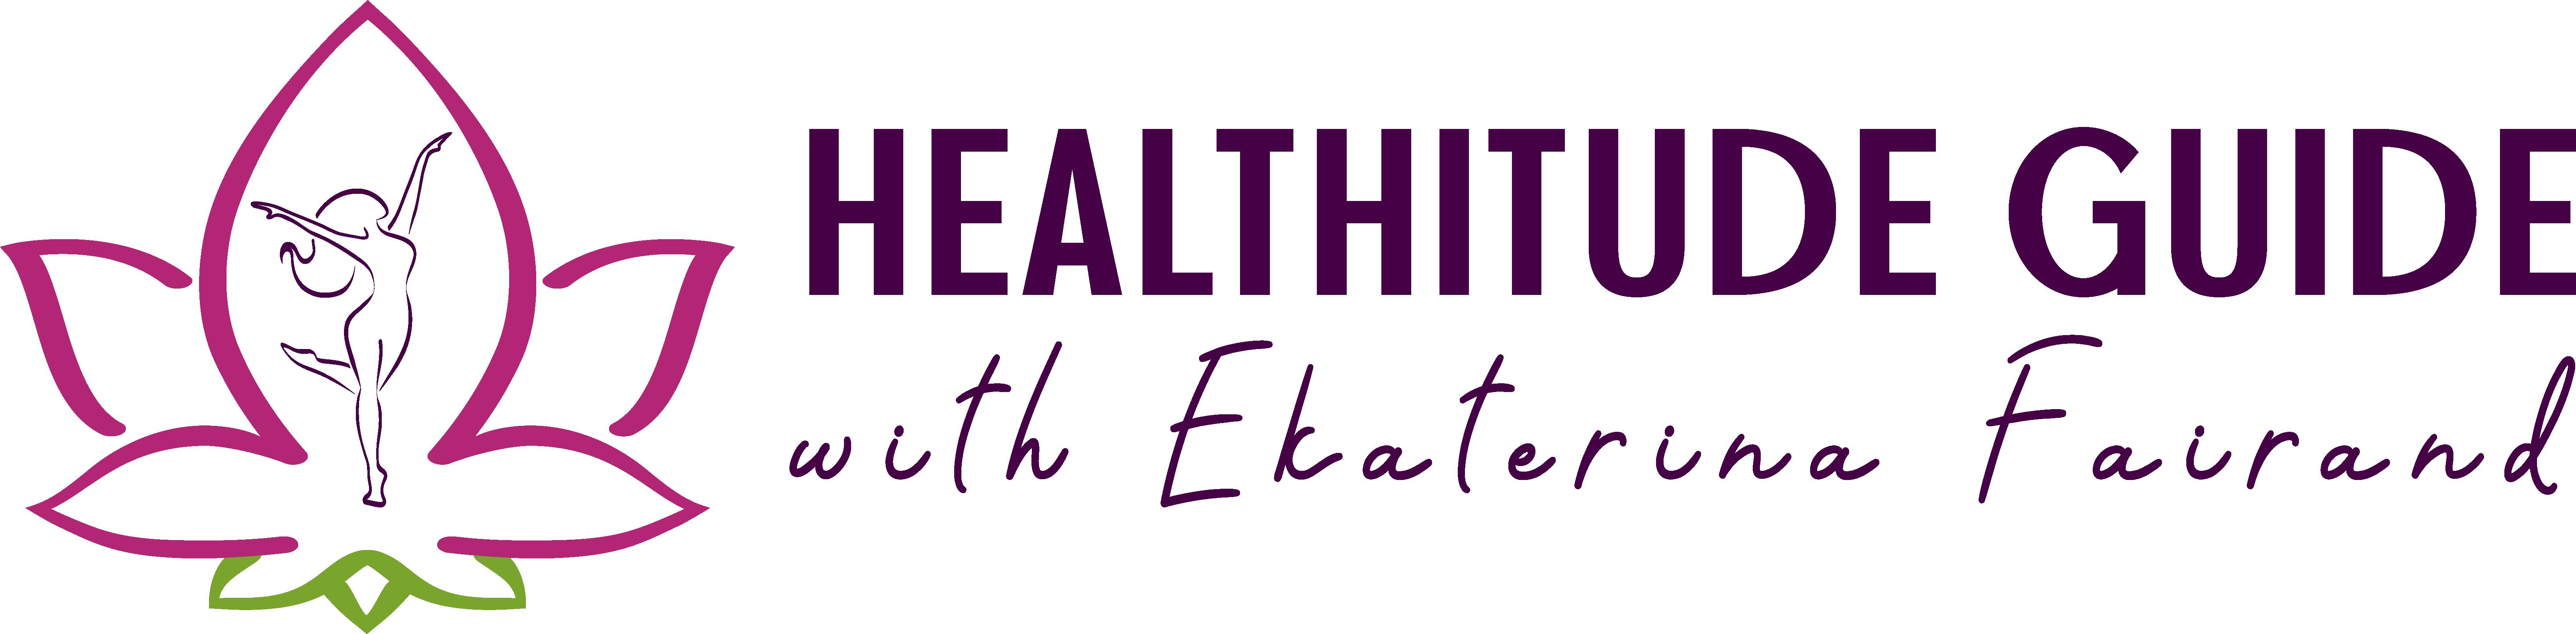 Healthitude Guide  c Екатериной Феран